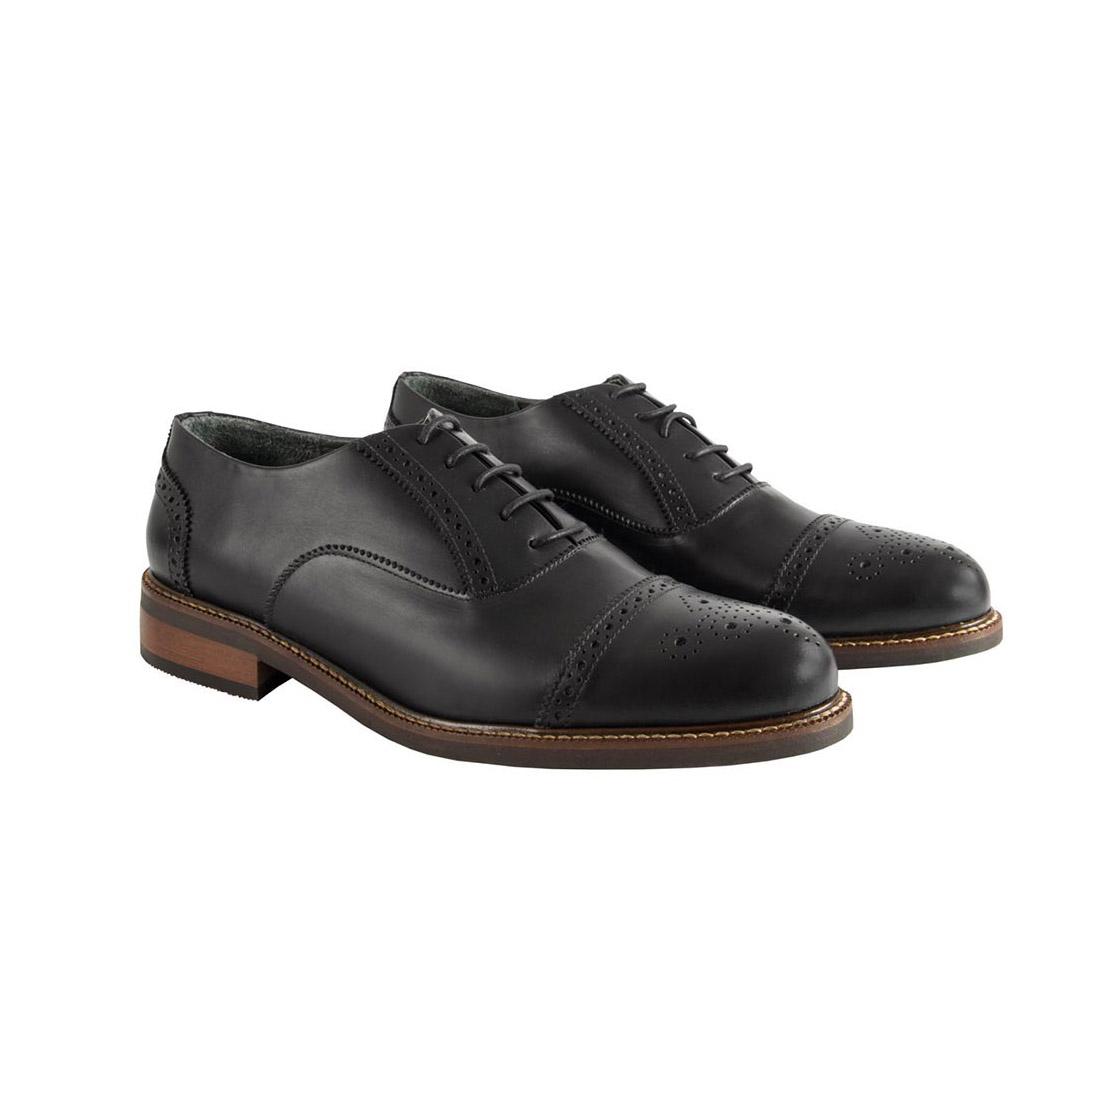 004-zapato-composition-e1563487553587